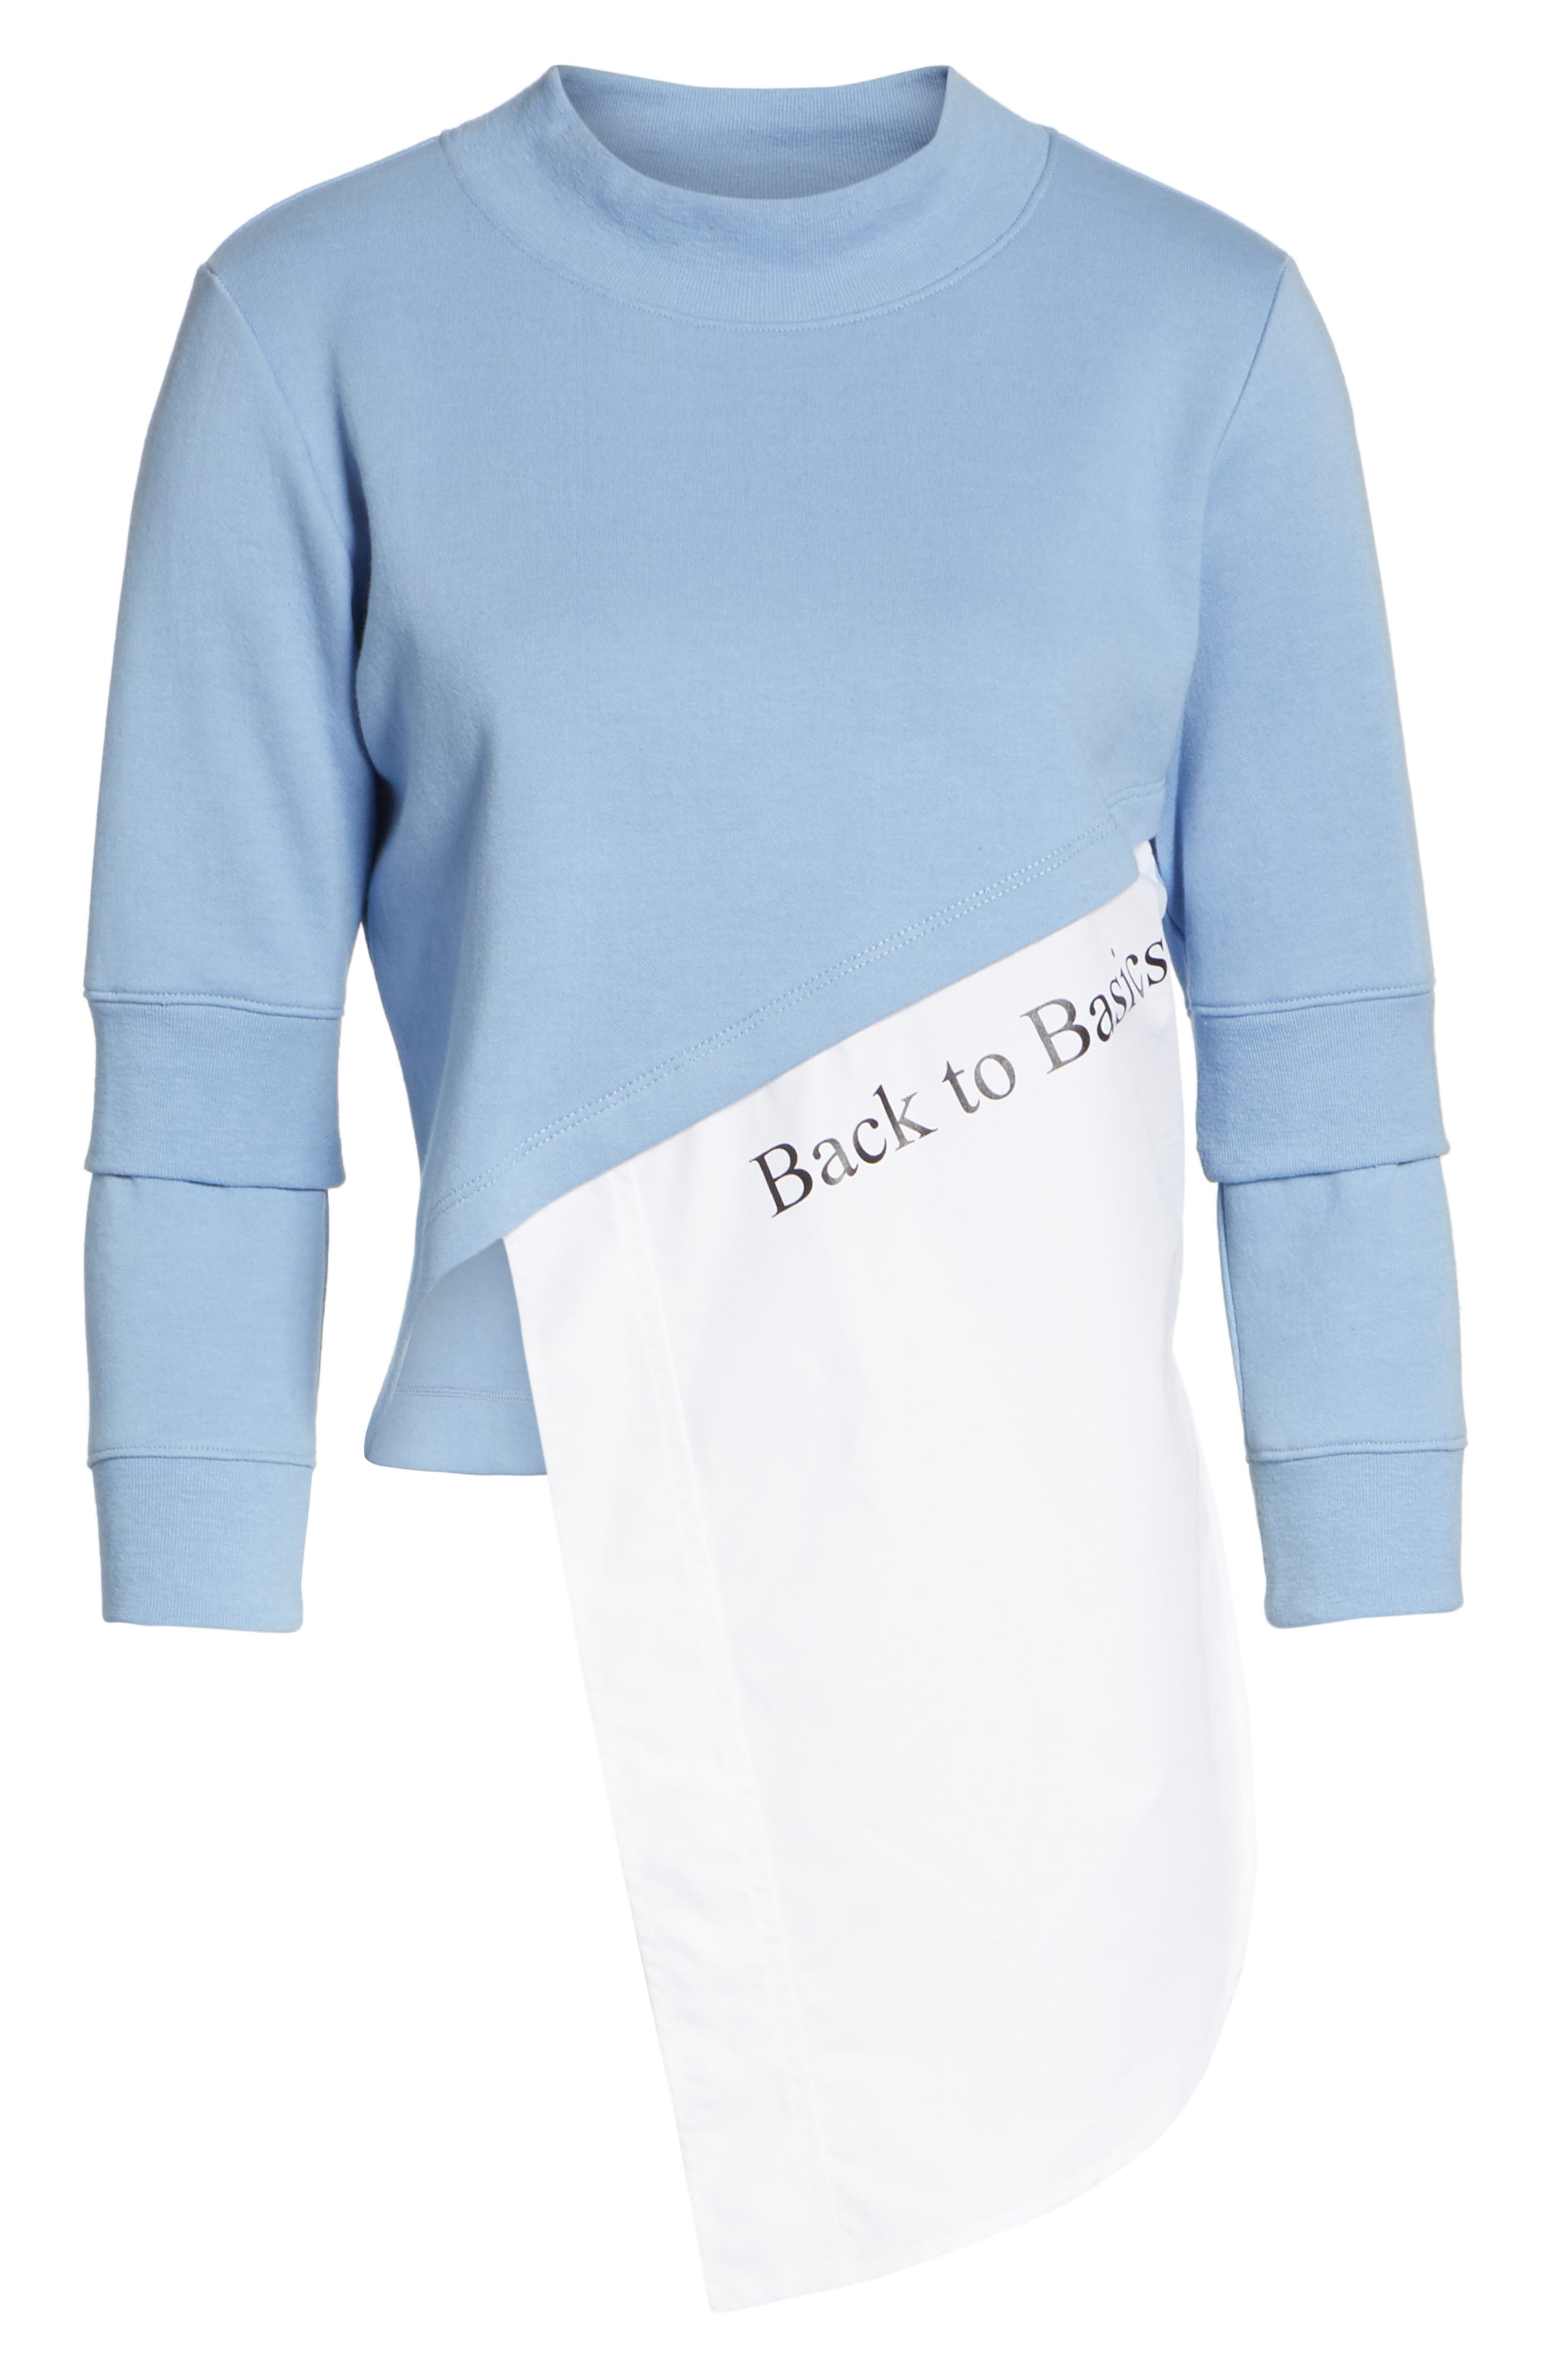 Asymmetrical Mixed Media Sweatshirt,                             Alternate thumbnail 6, color,                             LIGHT BLUE/ WHITE